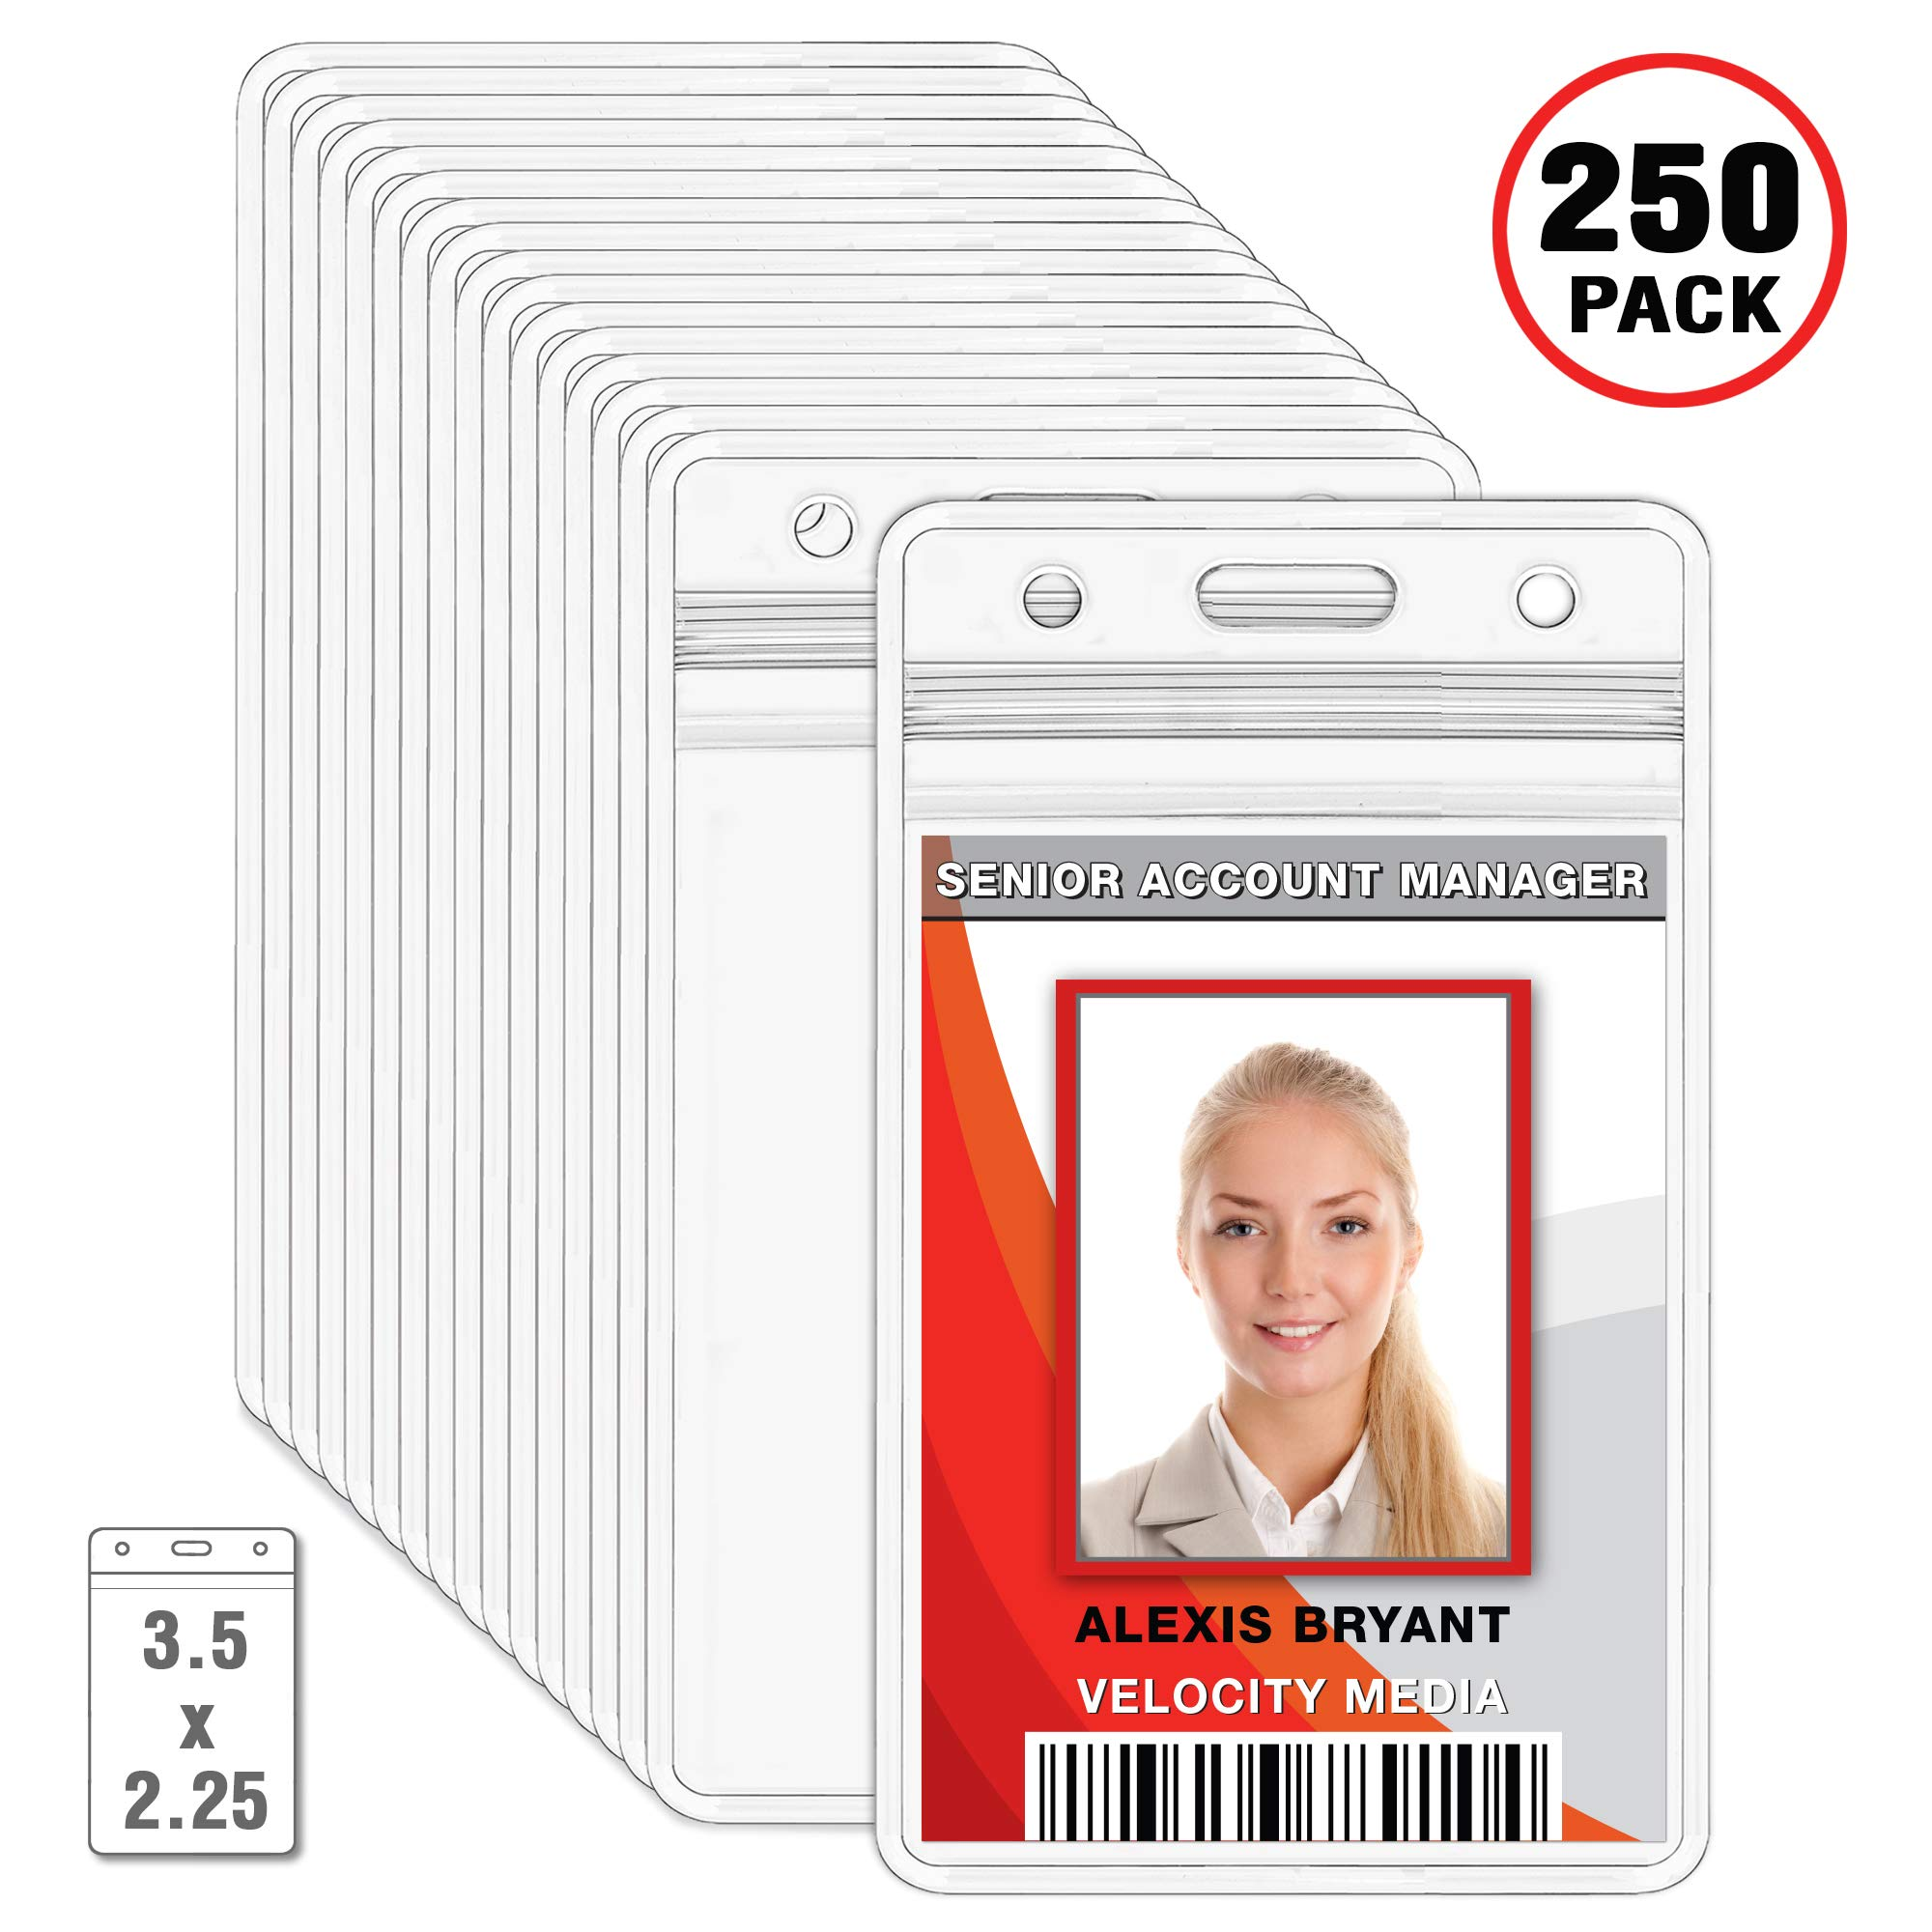 MIFFLIN Plastic ID Badge Holders, Vertical Hanging Card Holder with Zipper, Clear Bulk Nametag Holders (250 Pack)